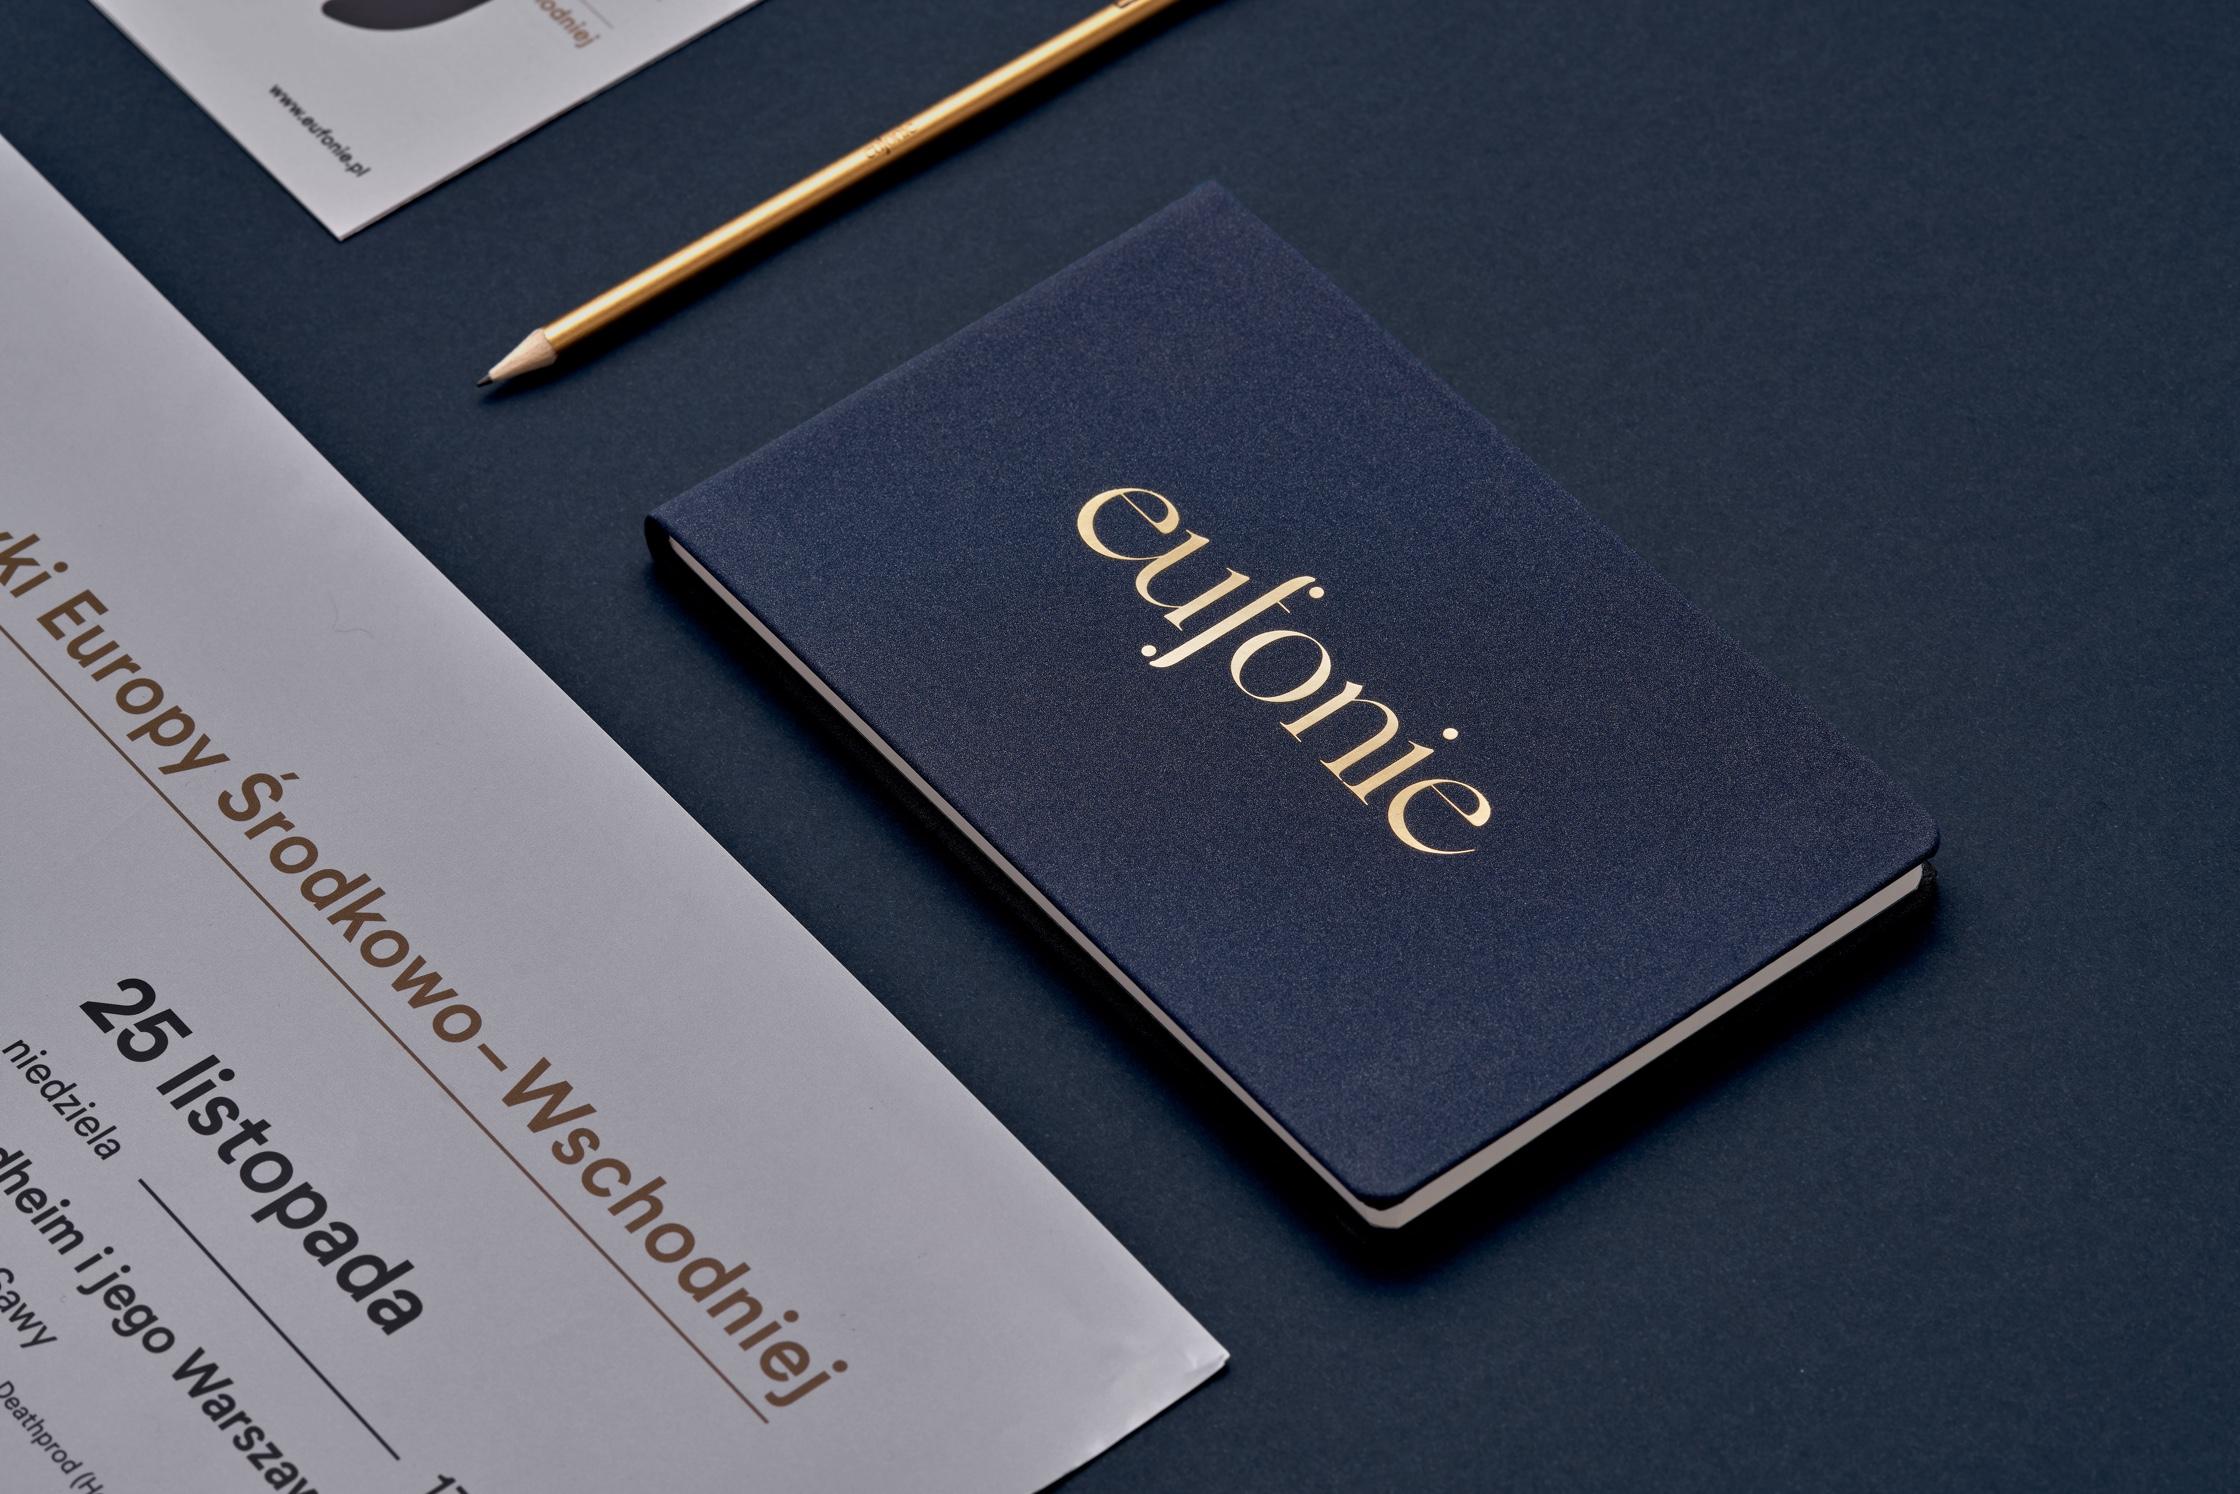 Notebook design - Eufonie Festival by Uniforma